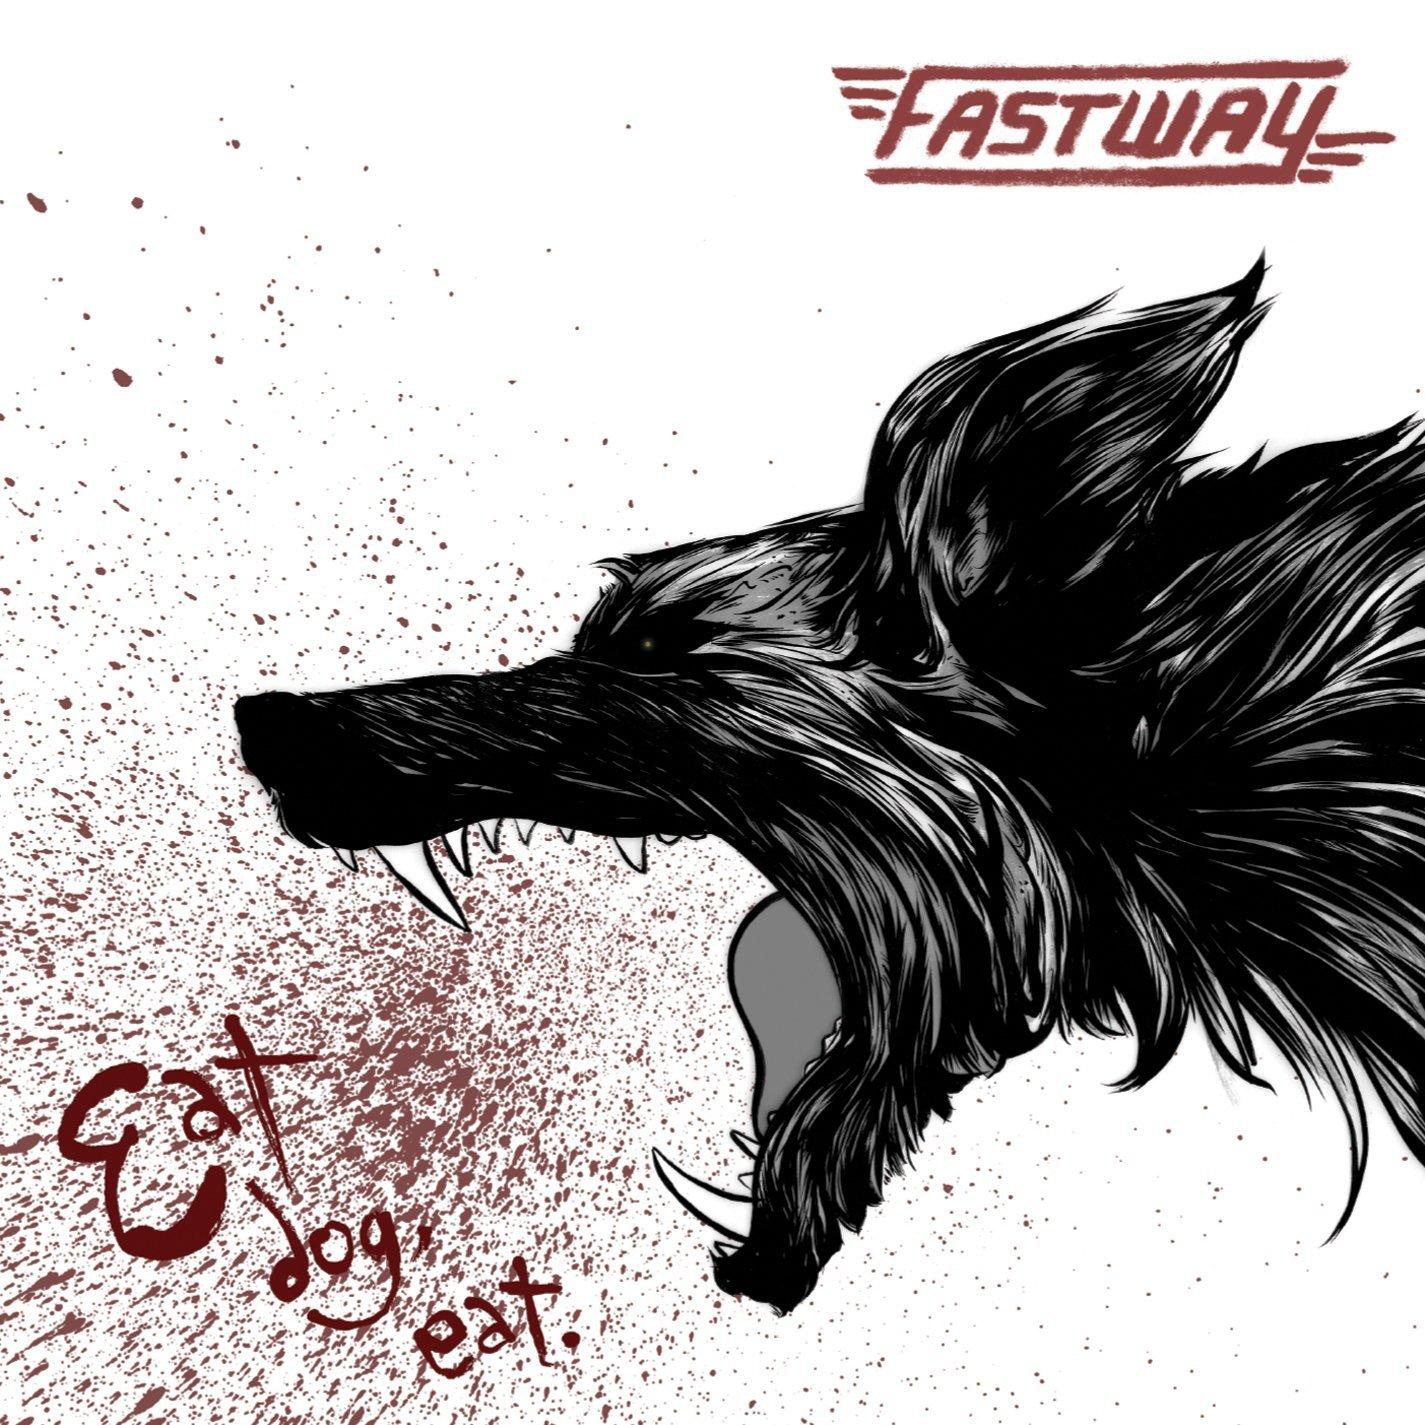 Fastway - Eat Dog Eat - Album Review